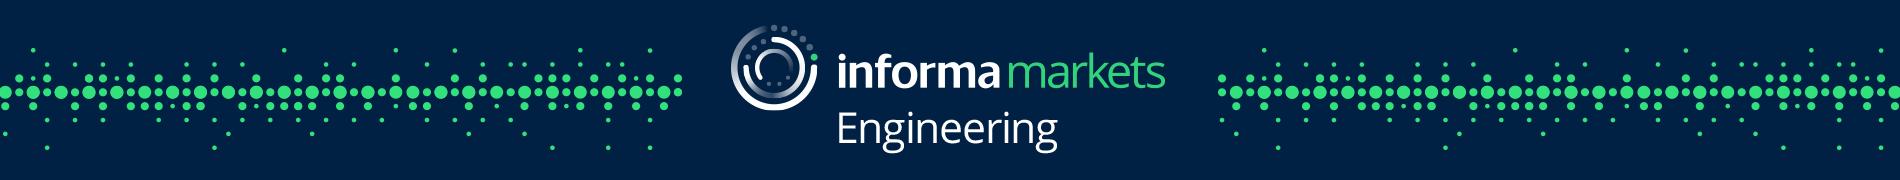 Informa Markets - Engineering